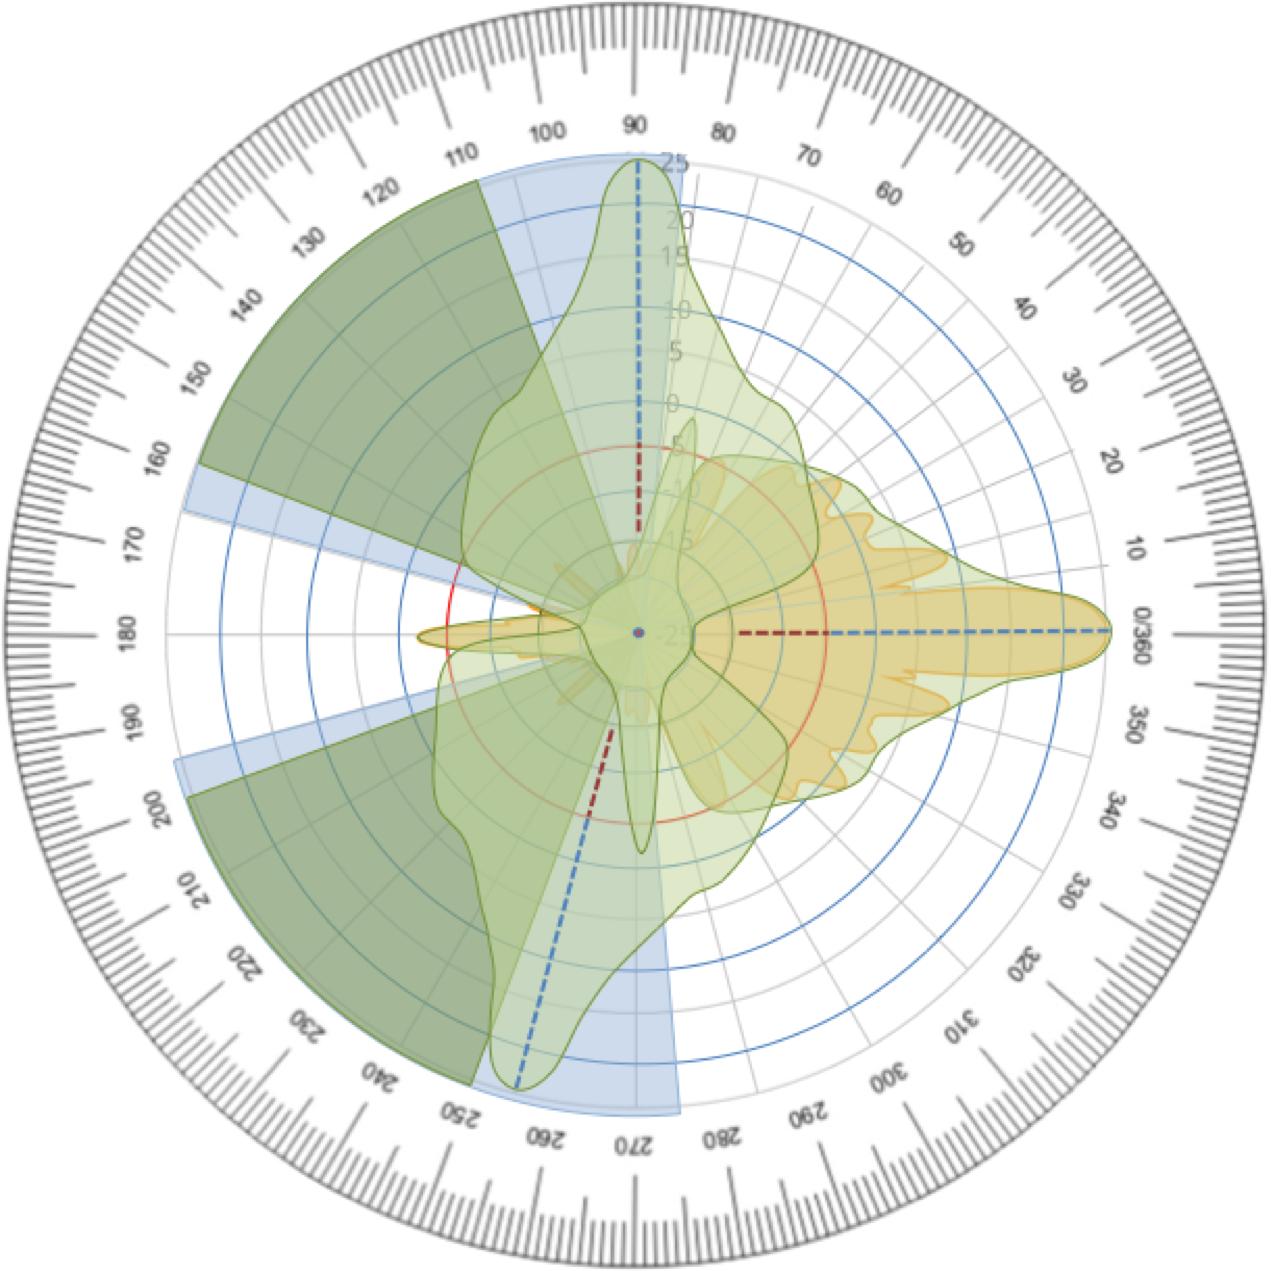 tdma-whitepaper-Figure-15.png